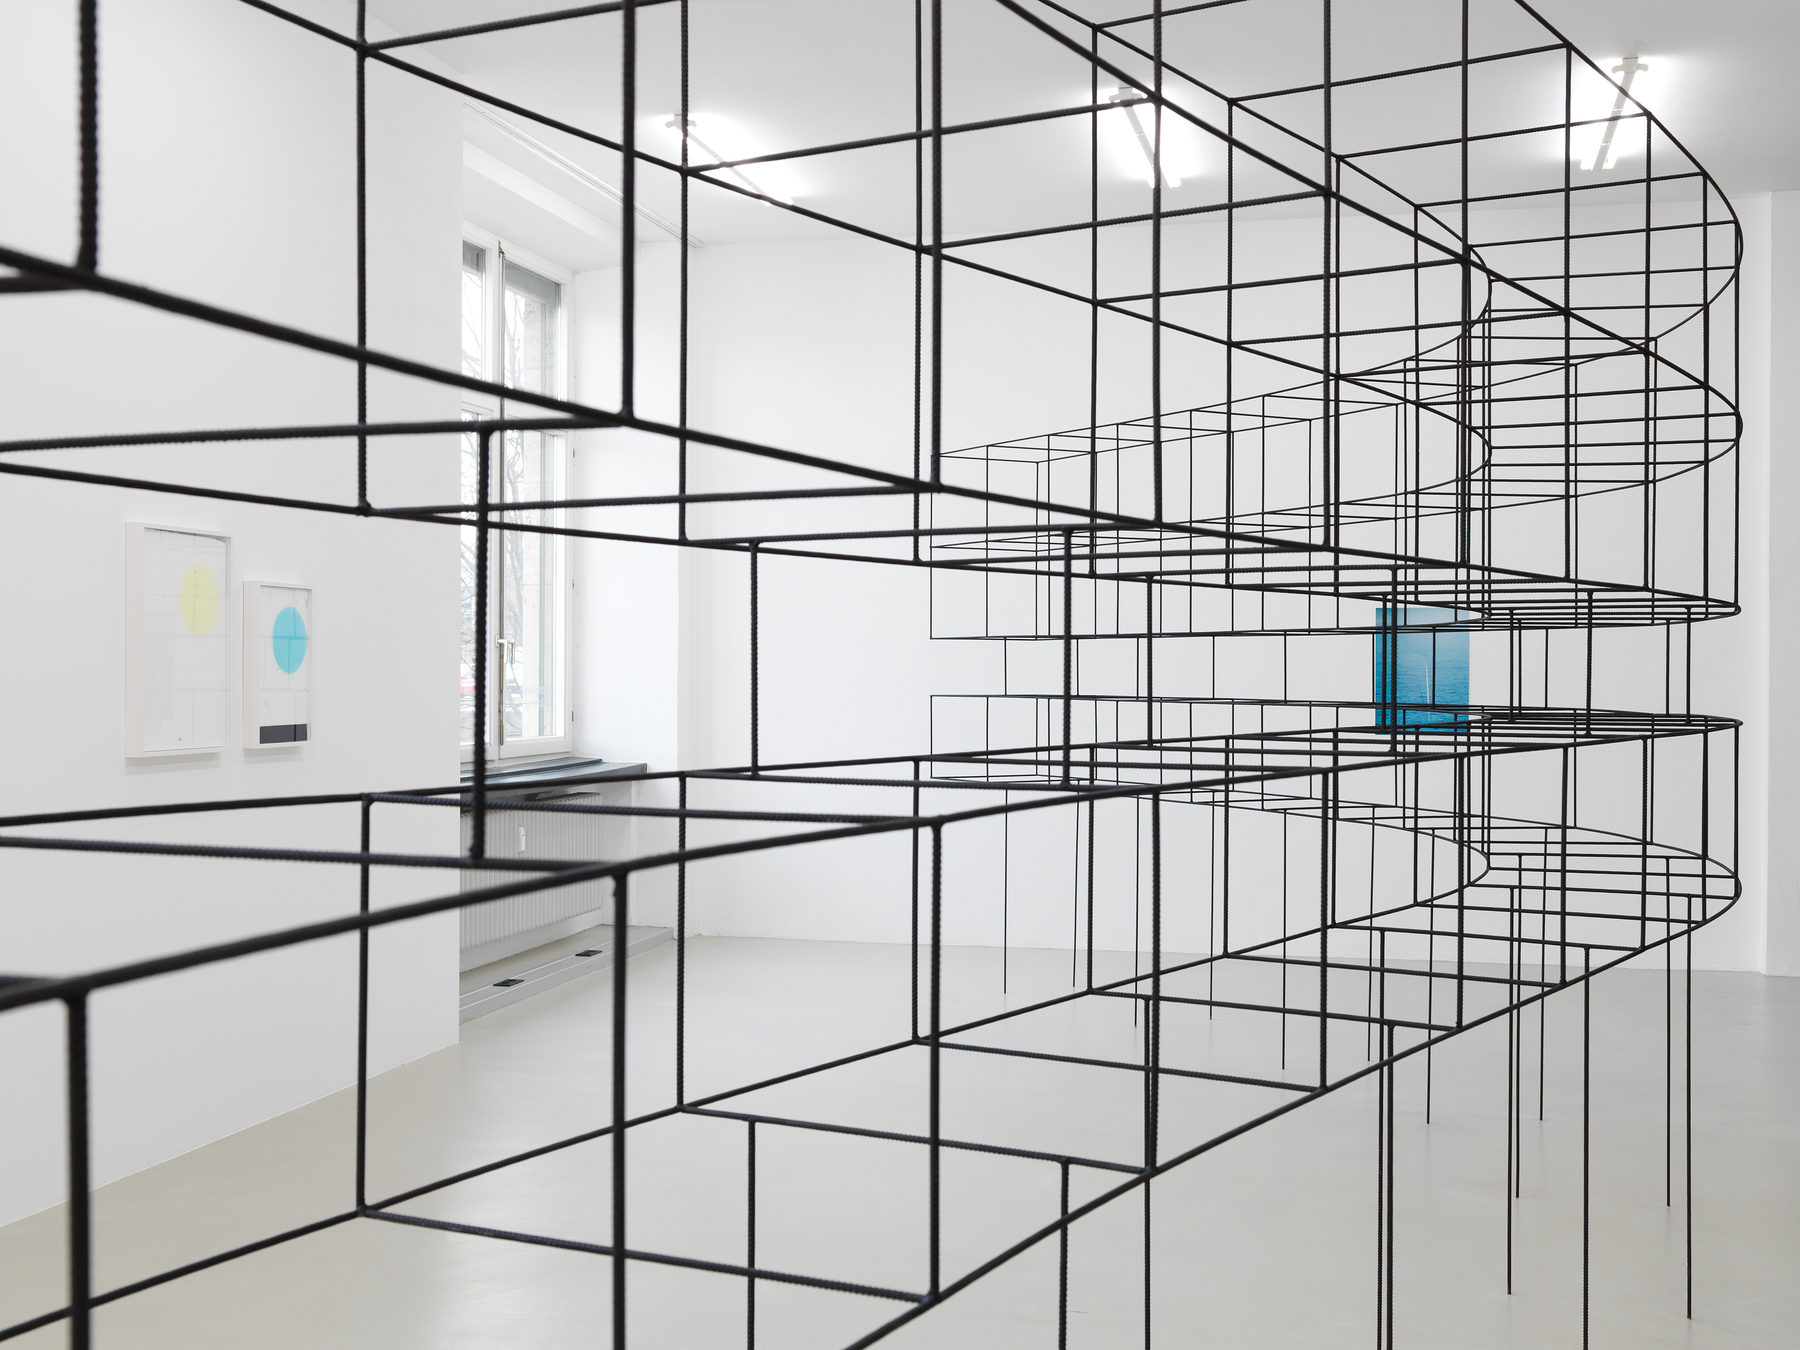 10_Edit Oderbolz_Kunstverein Nürnberg_2017